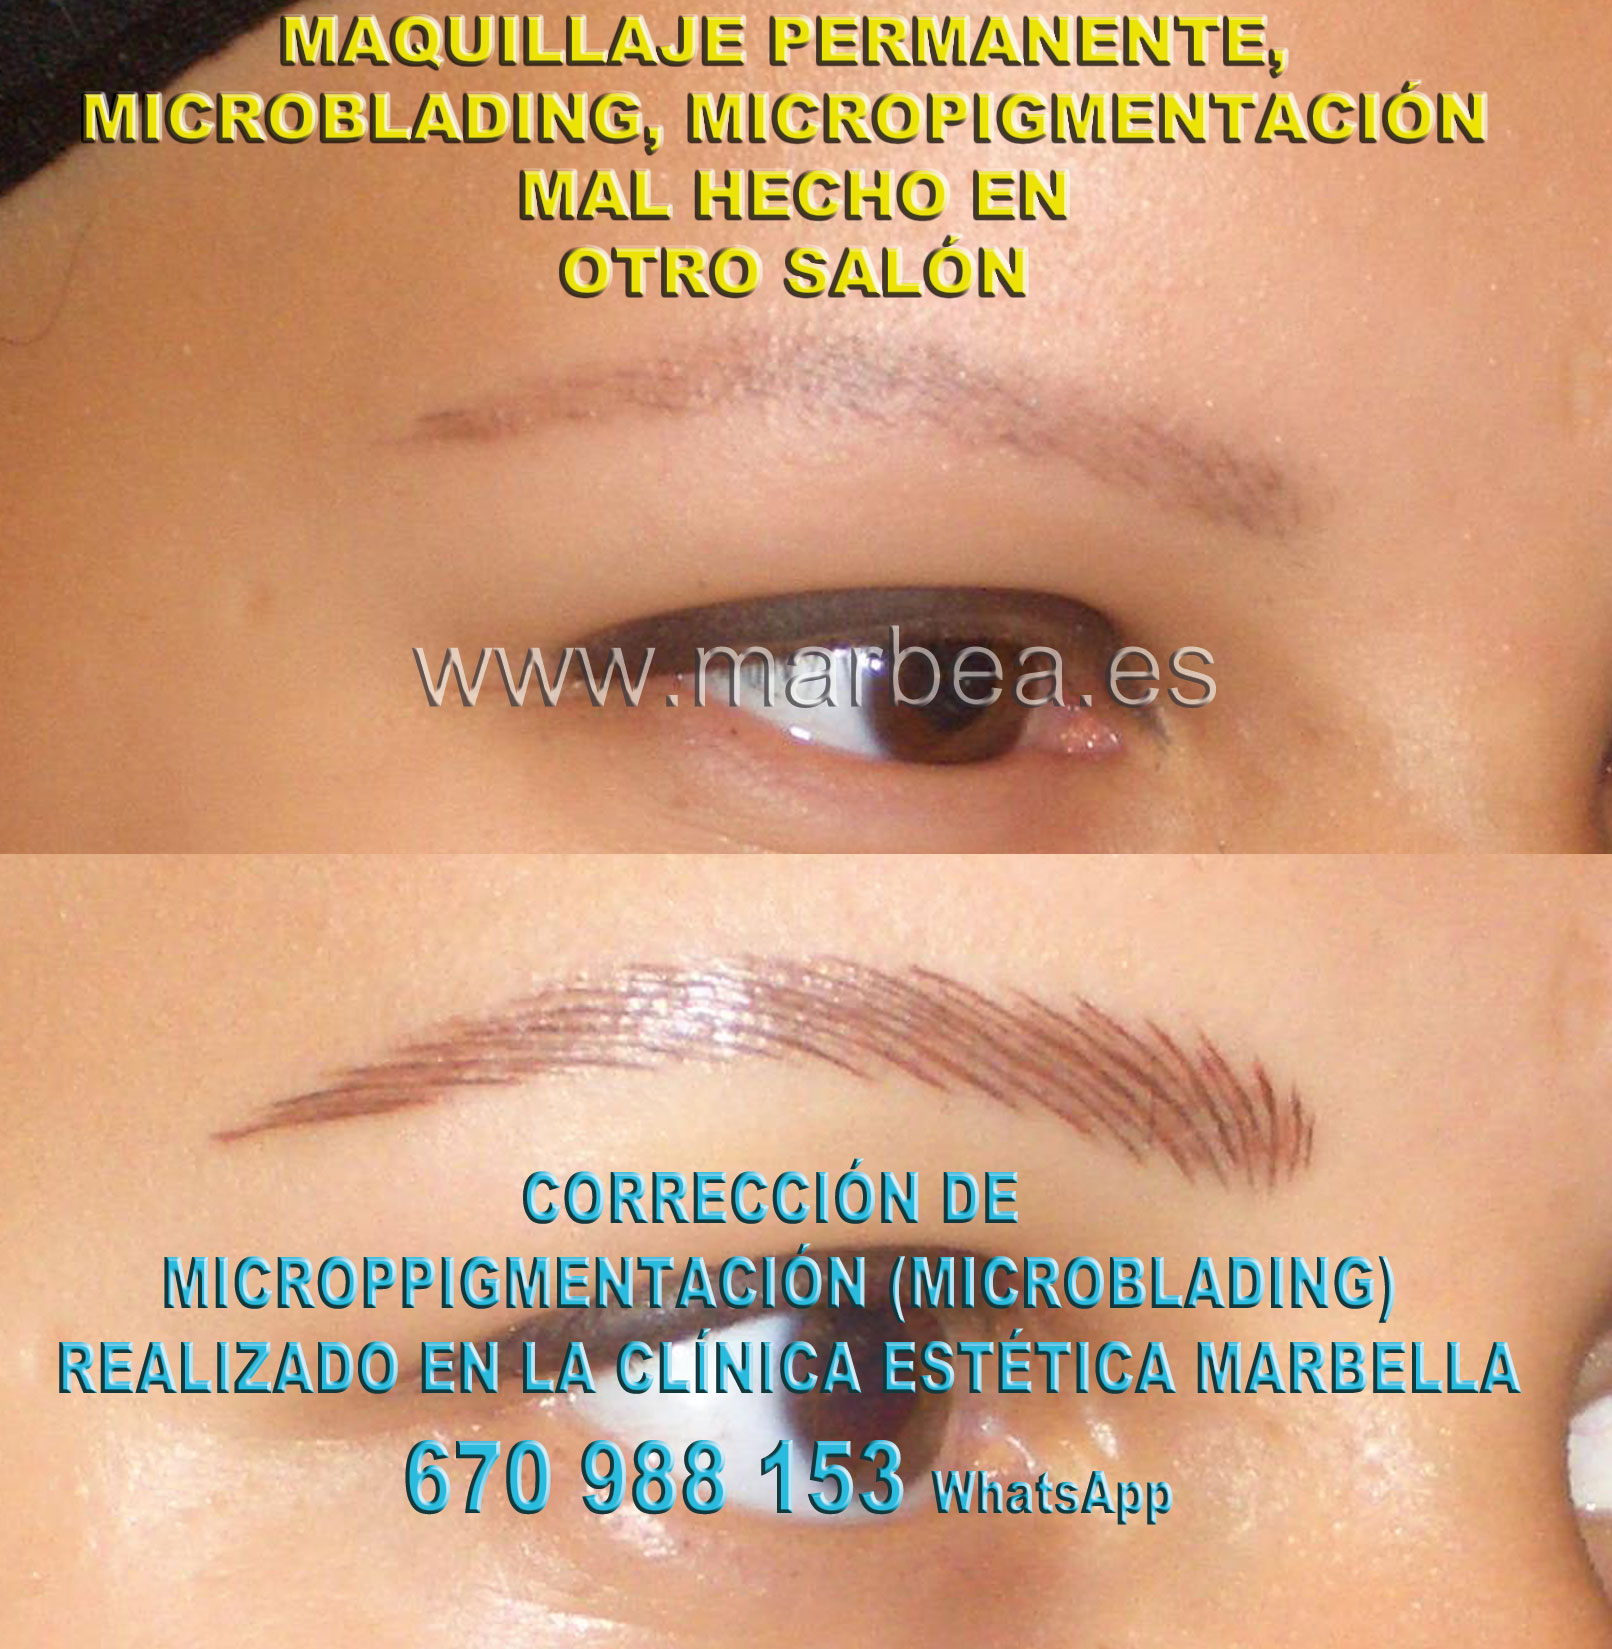 ELIMINAR MICROBLADING CEJAS clínica estética maquillaje semipermanente ofrece micropigmentacion correctiva de cejas,corregir micropigmentación mal hecha